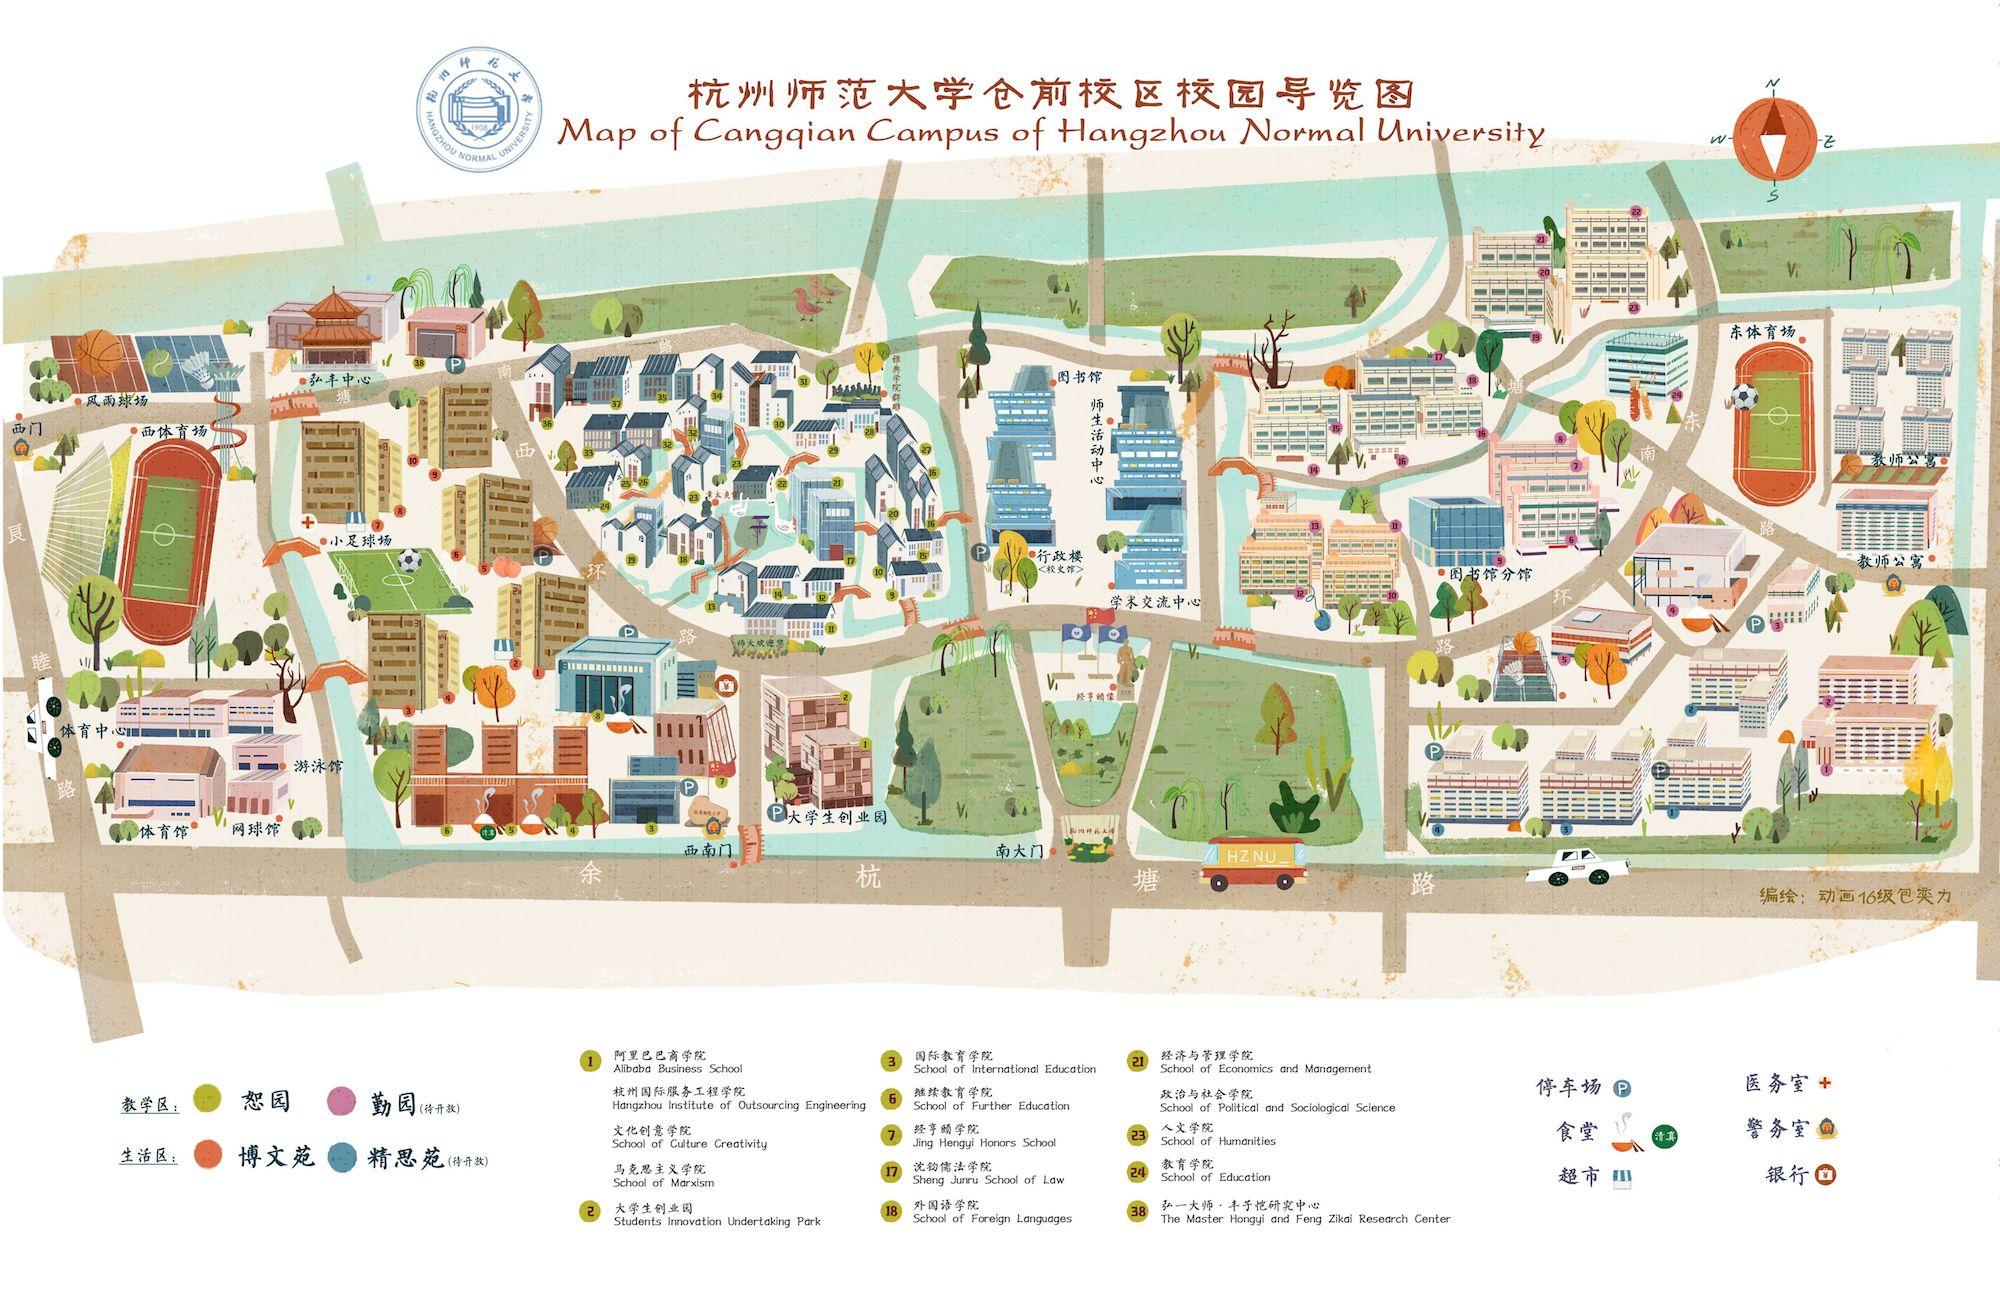 Hangzhou Normal University Campus Map